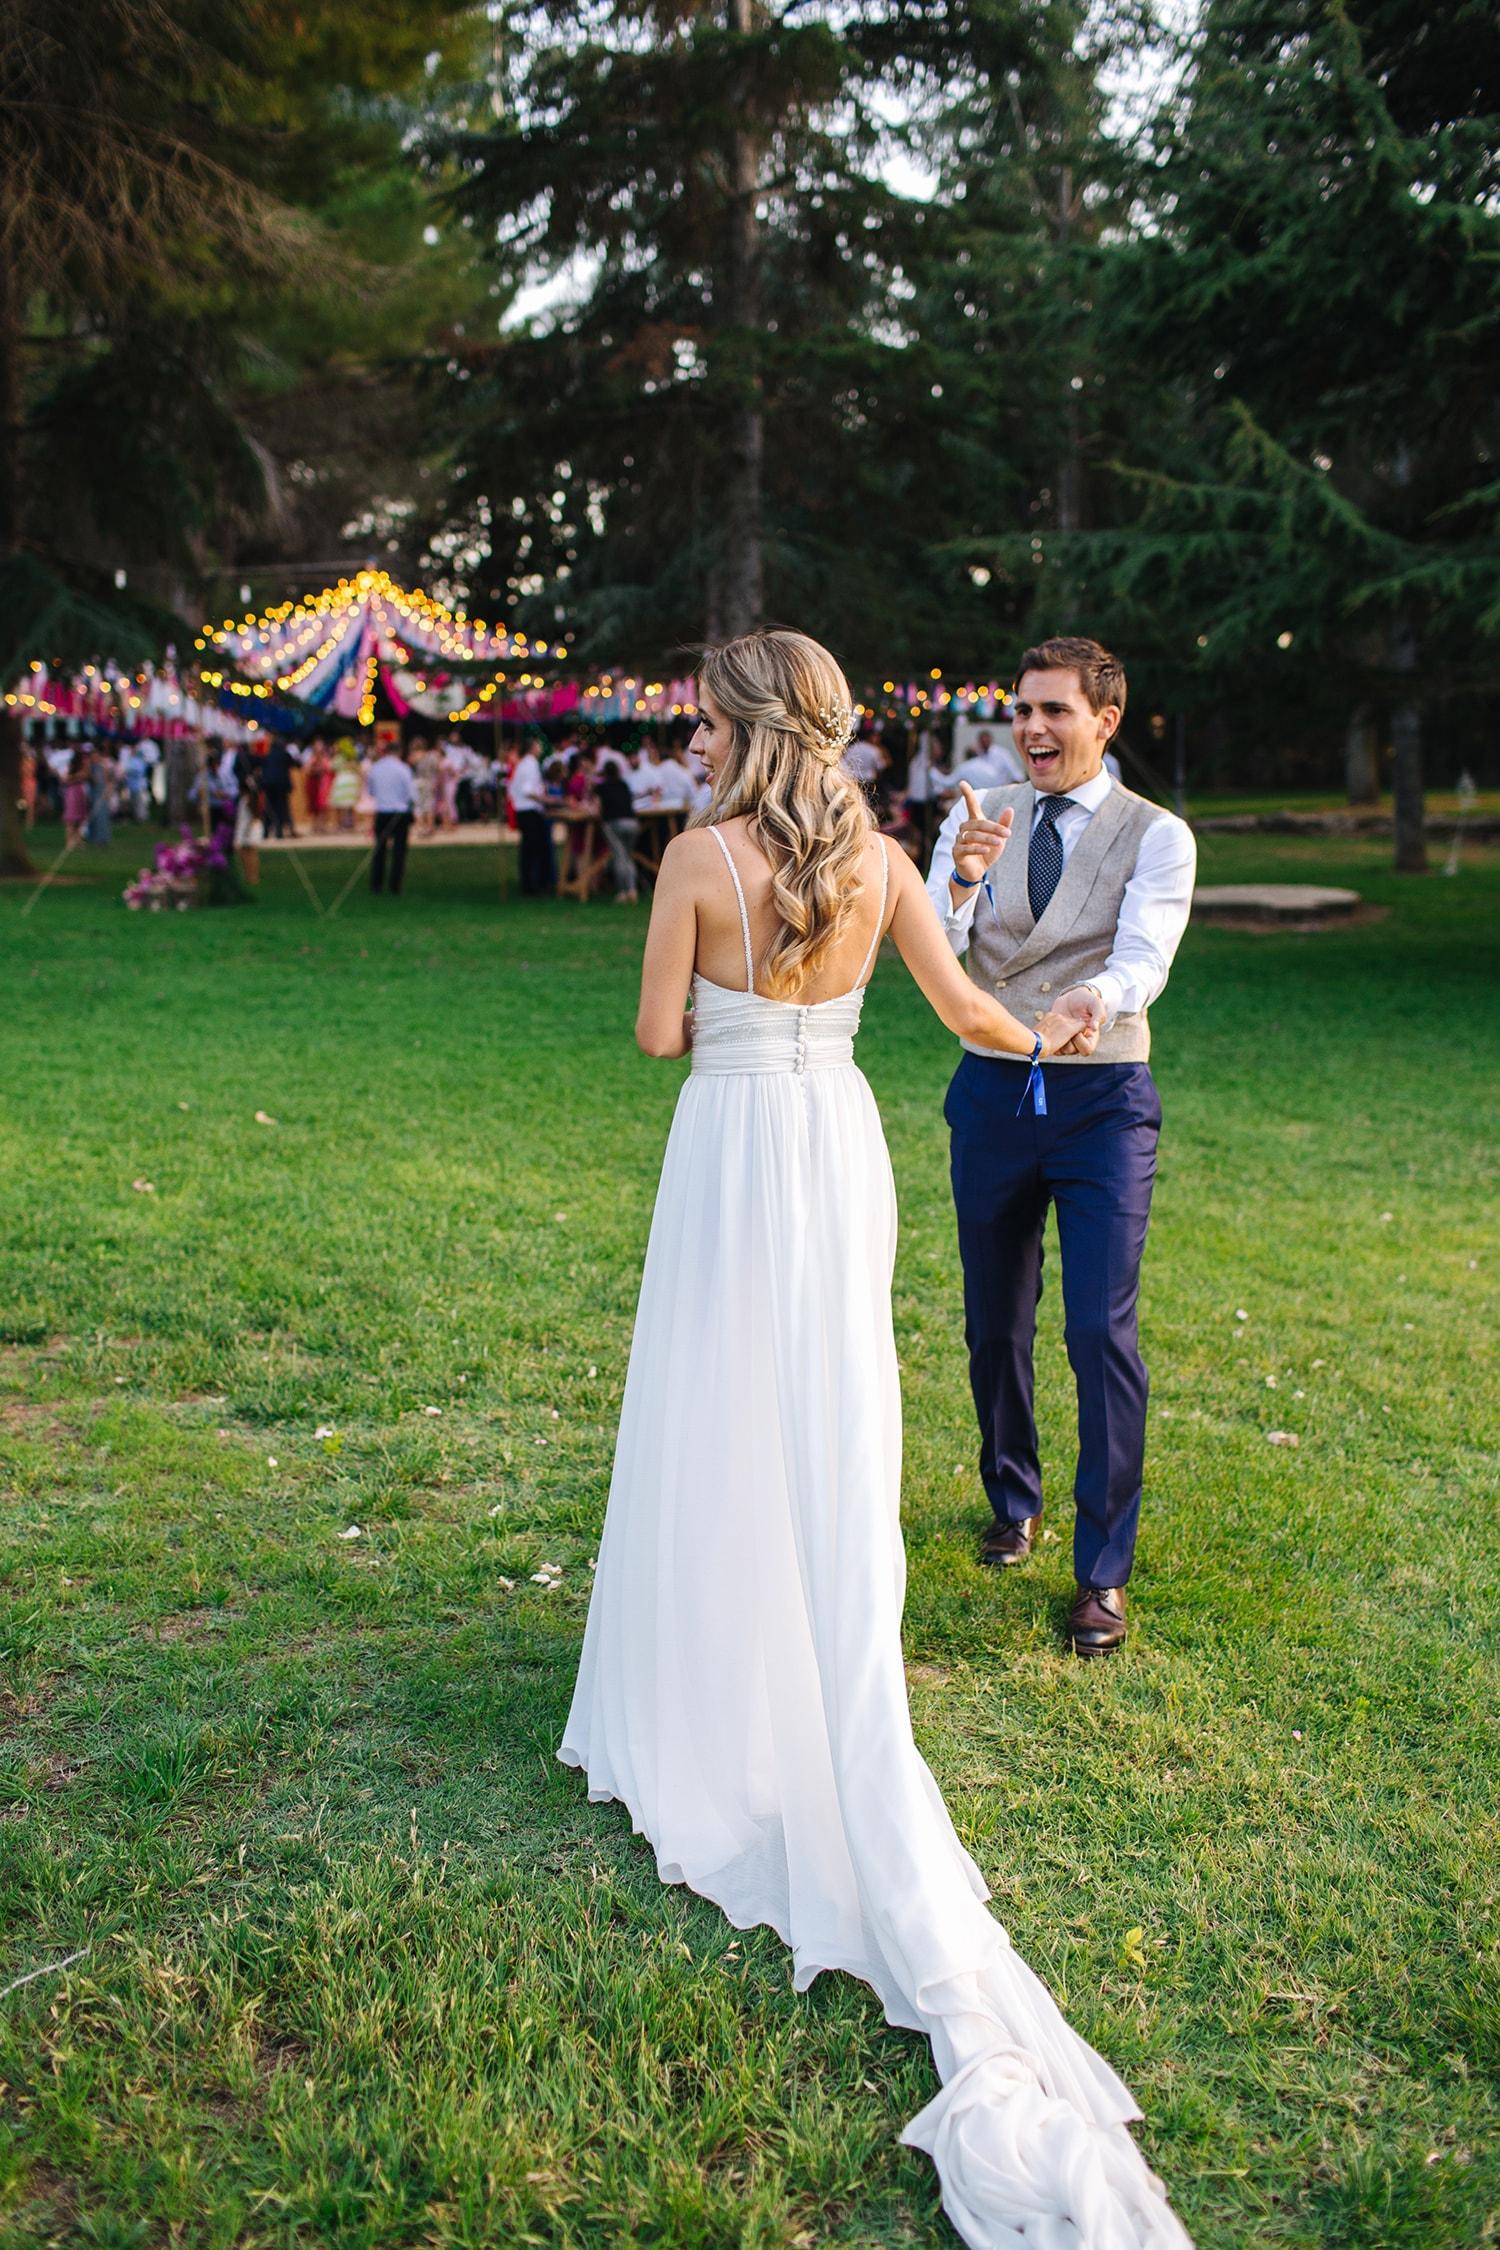 paulagfurio_verbena_wedding_spain_020.jpg